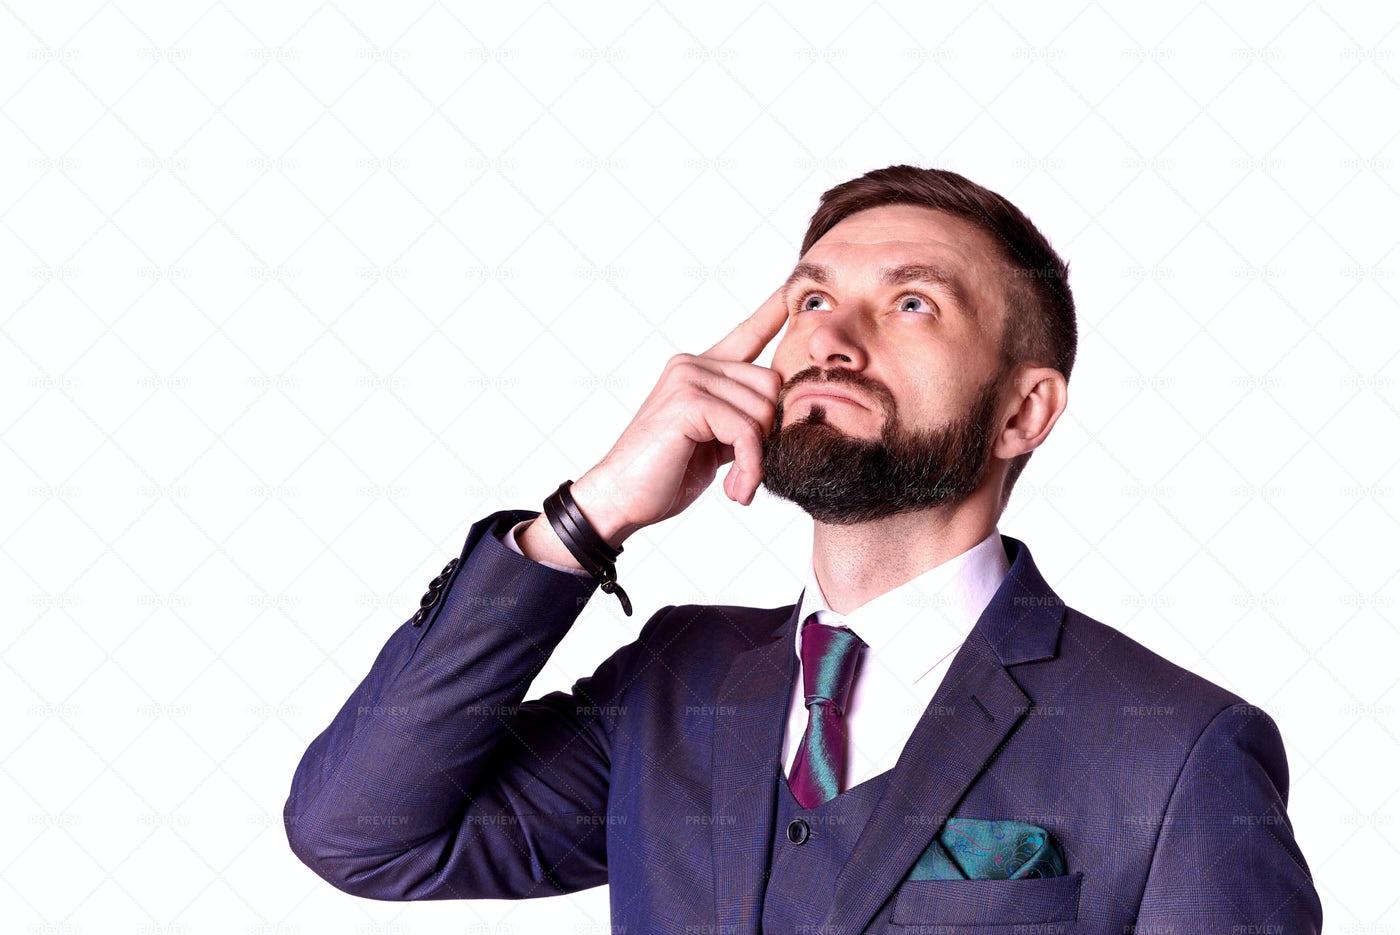 A Thinking Businessman: Stock Photos